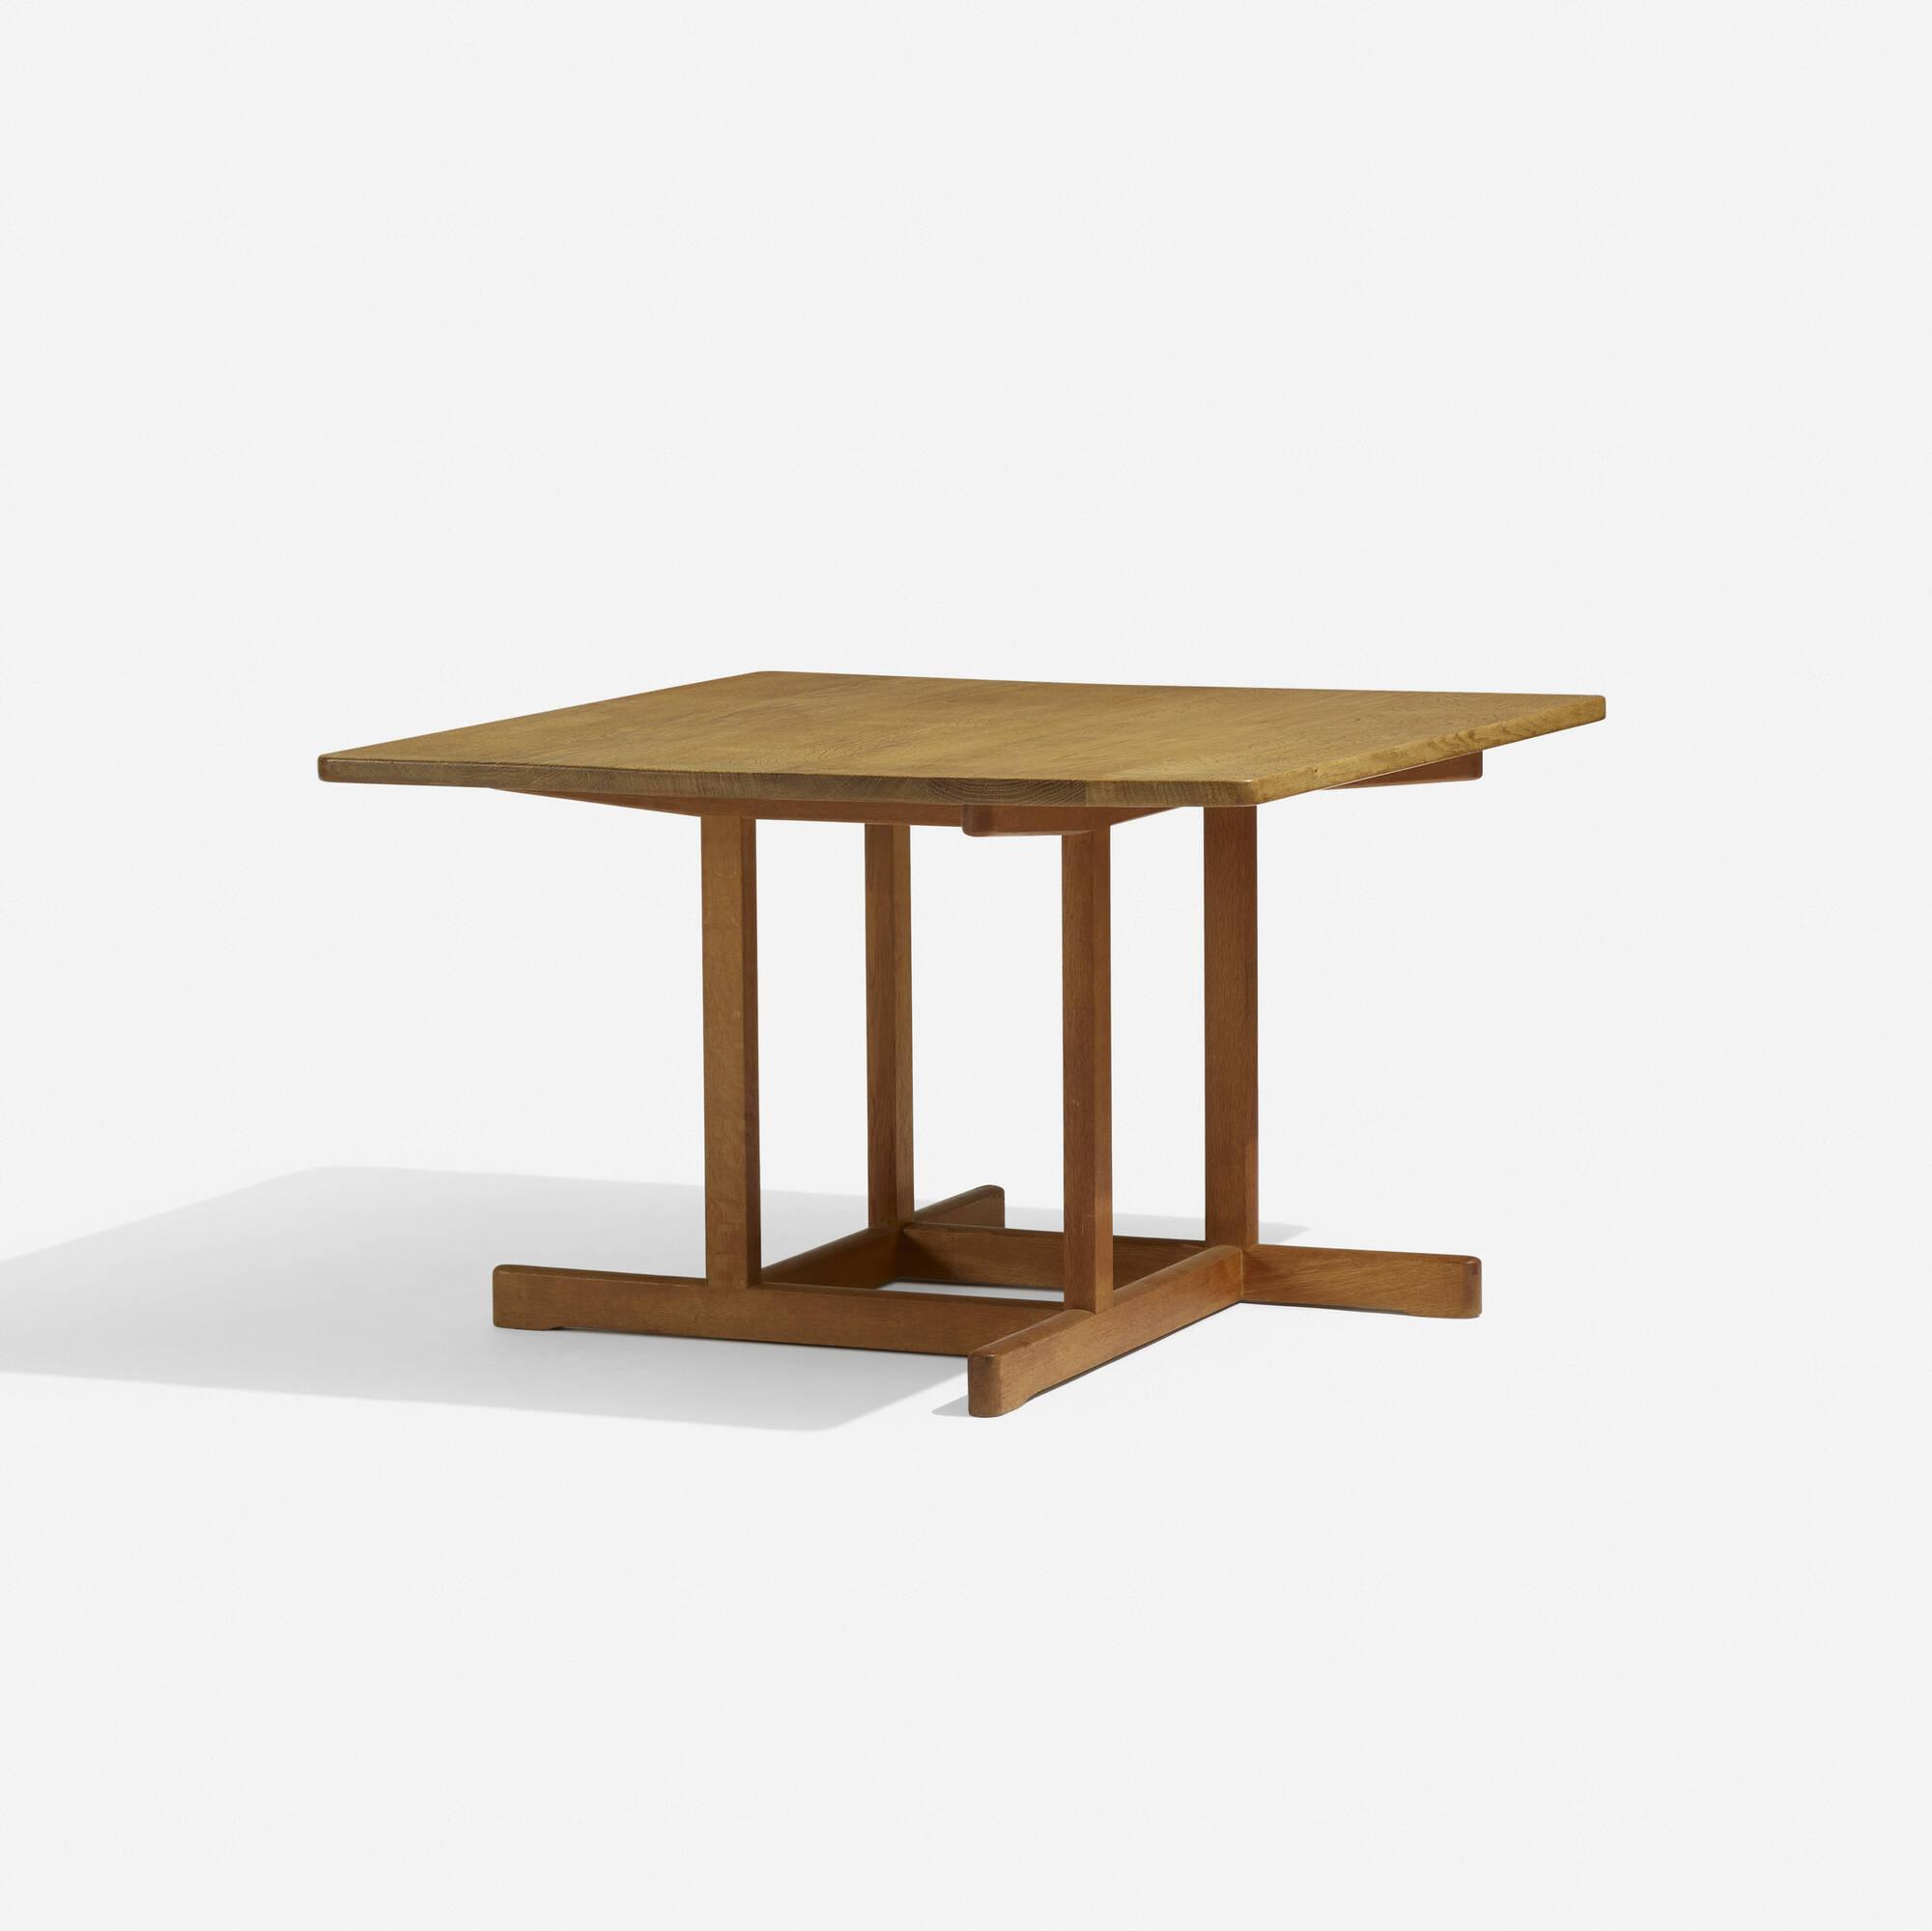 235: Børge Mogensen / coffee table, model 271 (1 of 3)